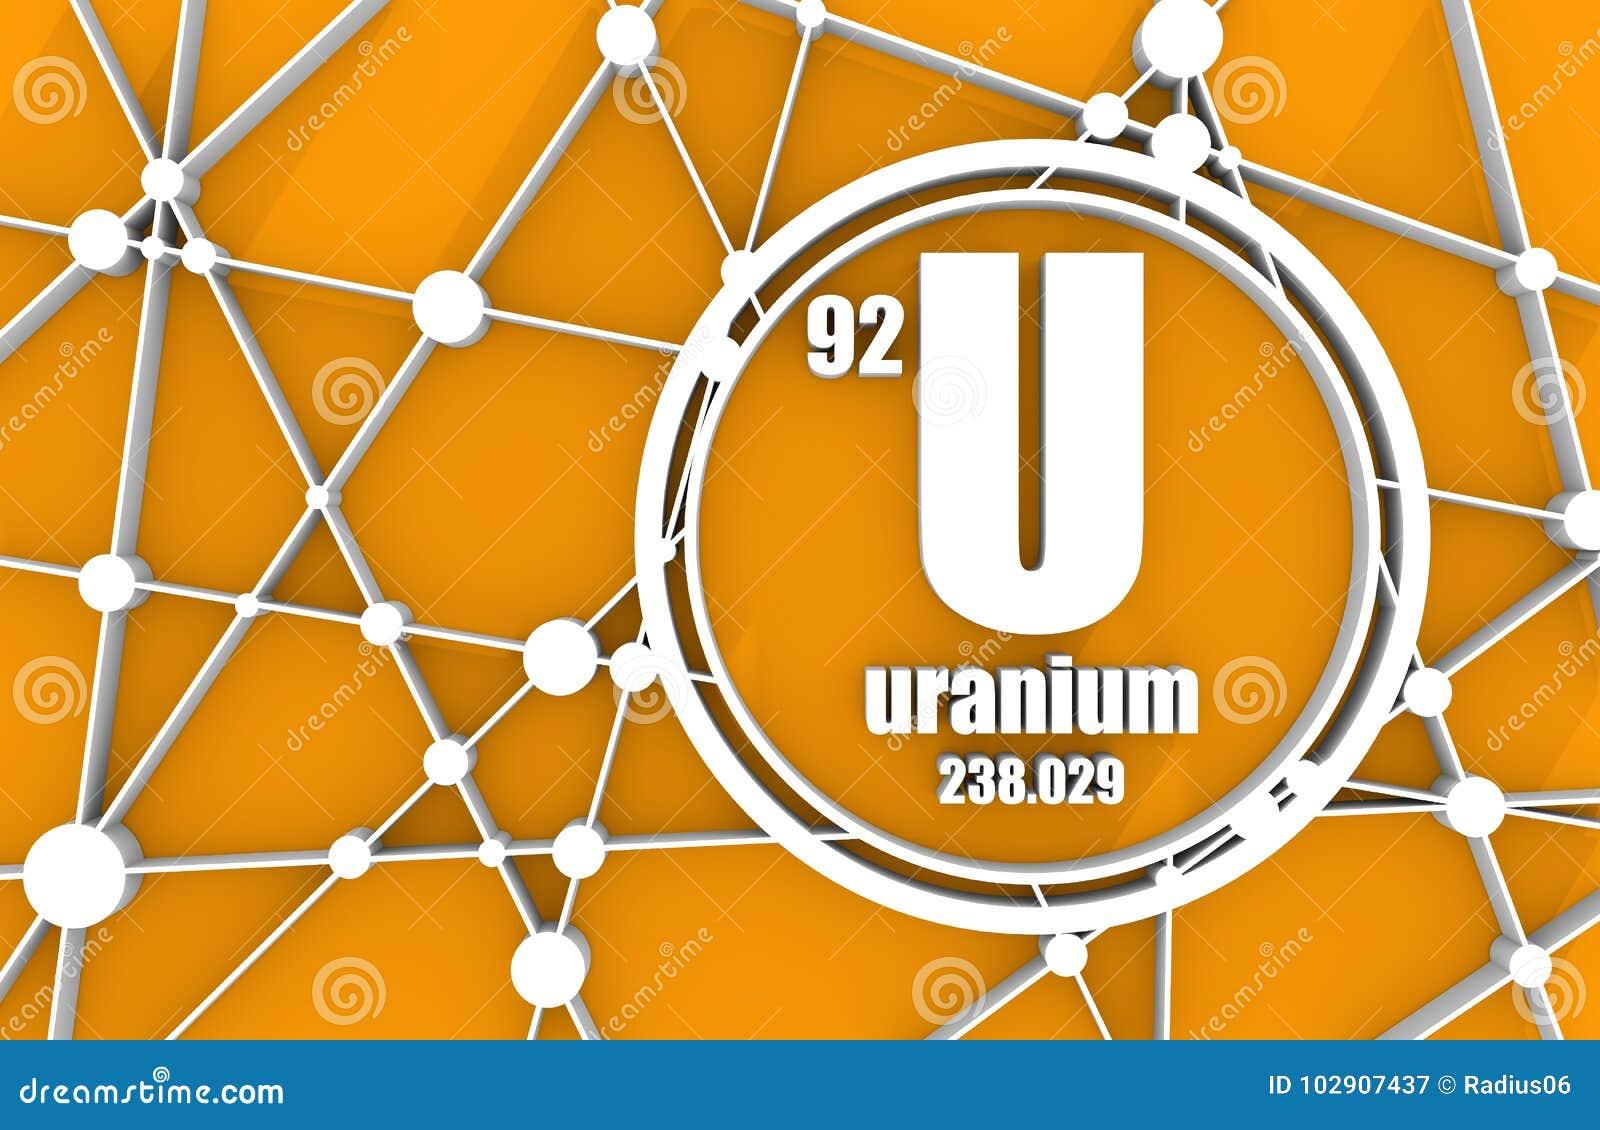 Uranium chemical element stock illustration illustration of fuel uranium chemical element sign with atomic number and atomic weight chemical element of periodic table molecule and communication background urtaz Choice Image